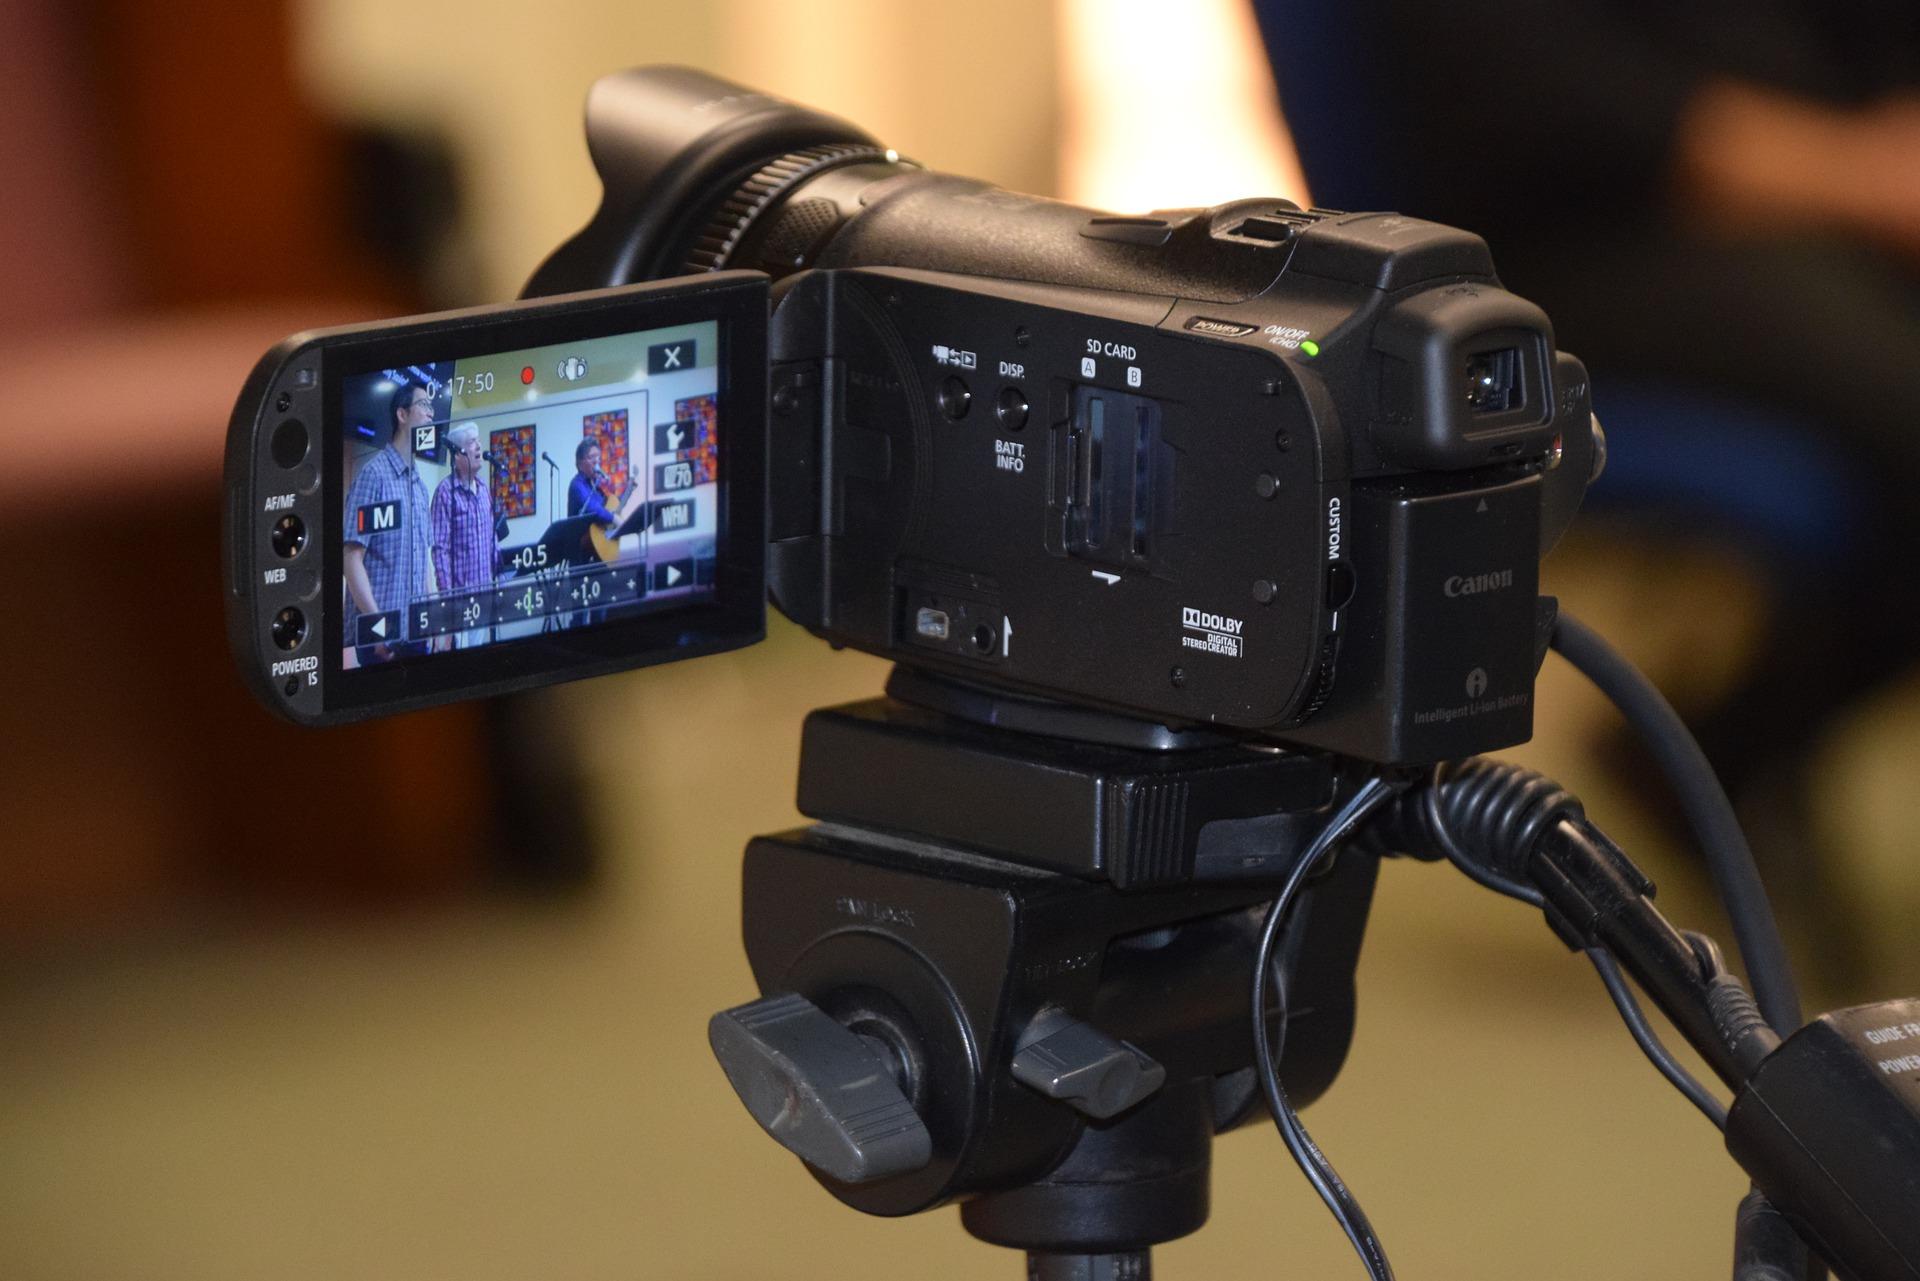 camera-equipment-5366711_1920